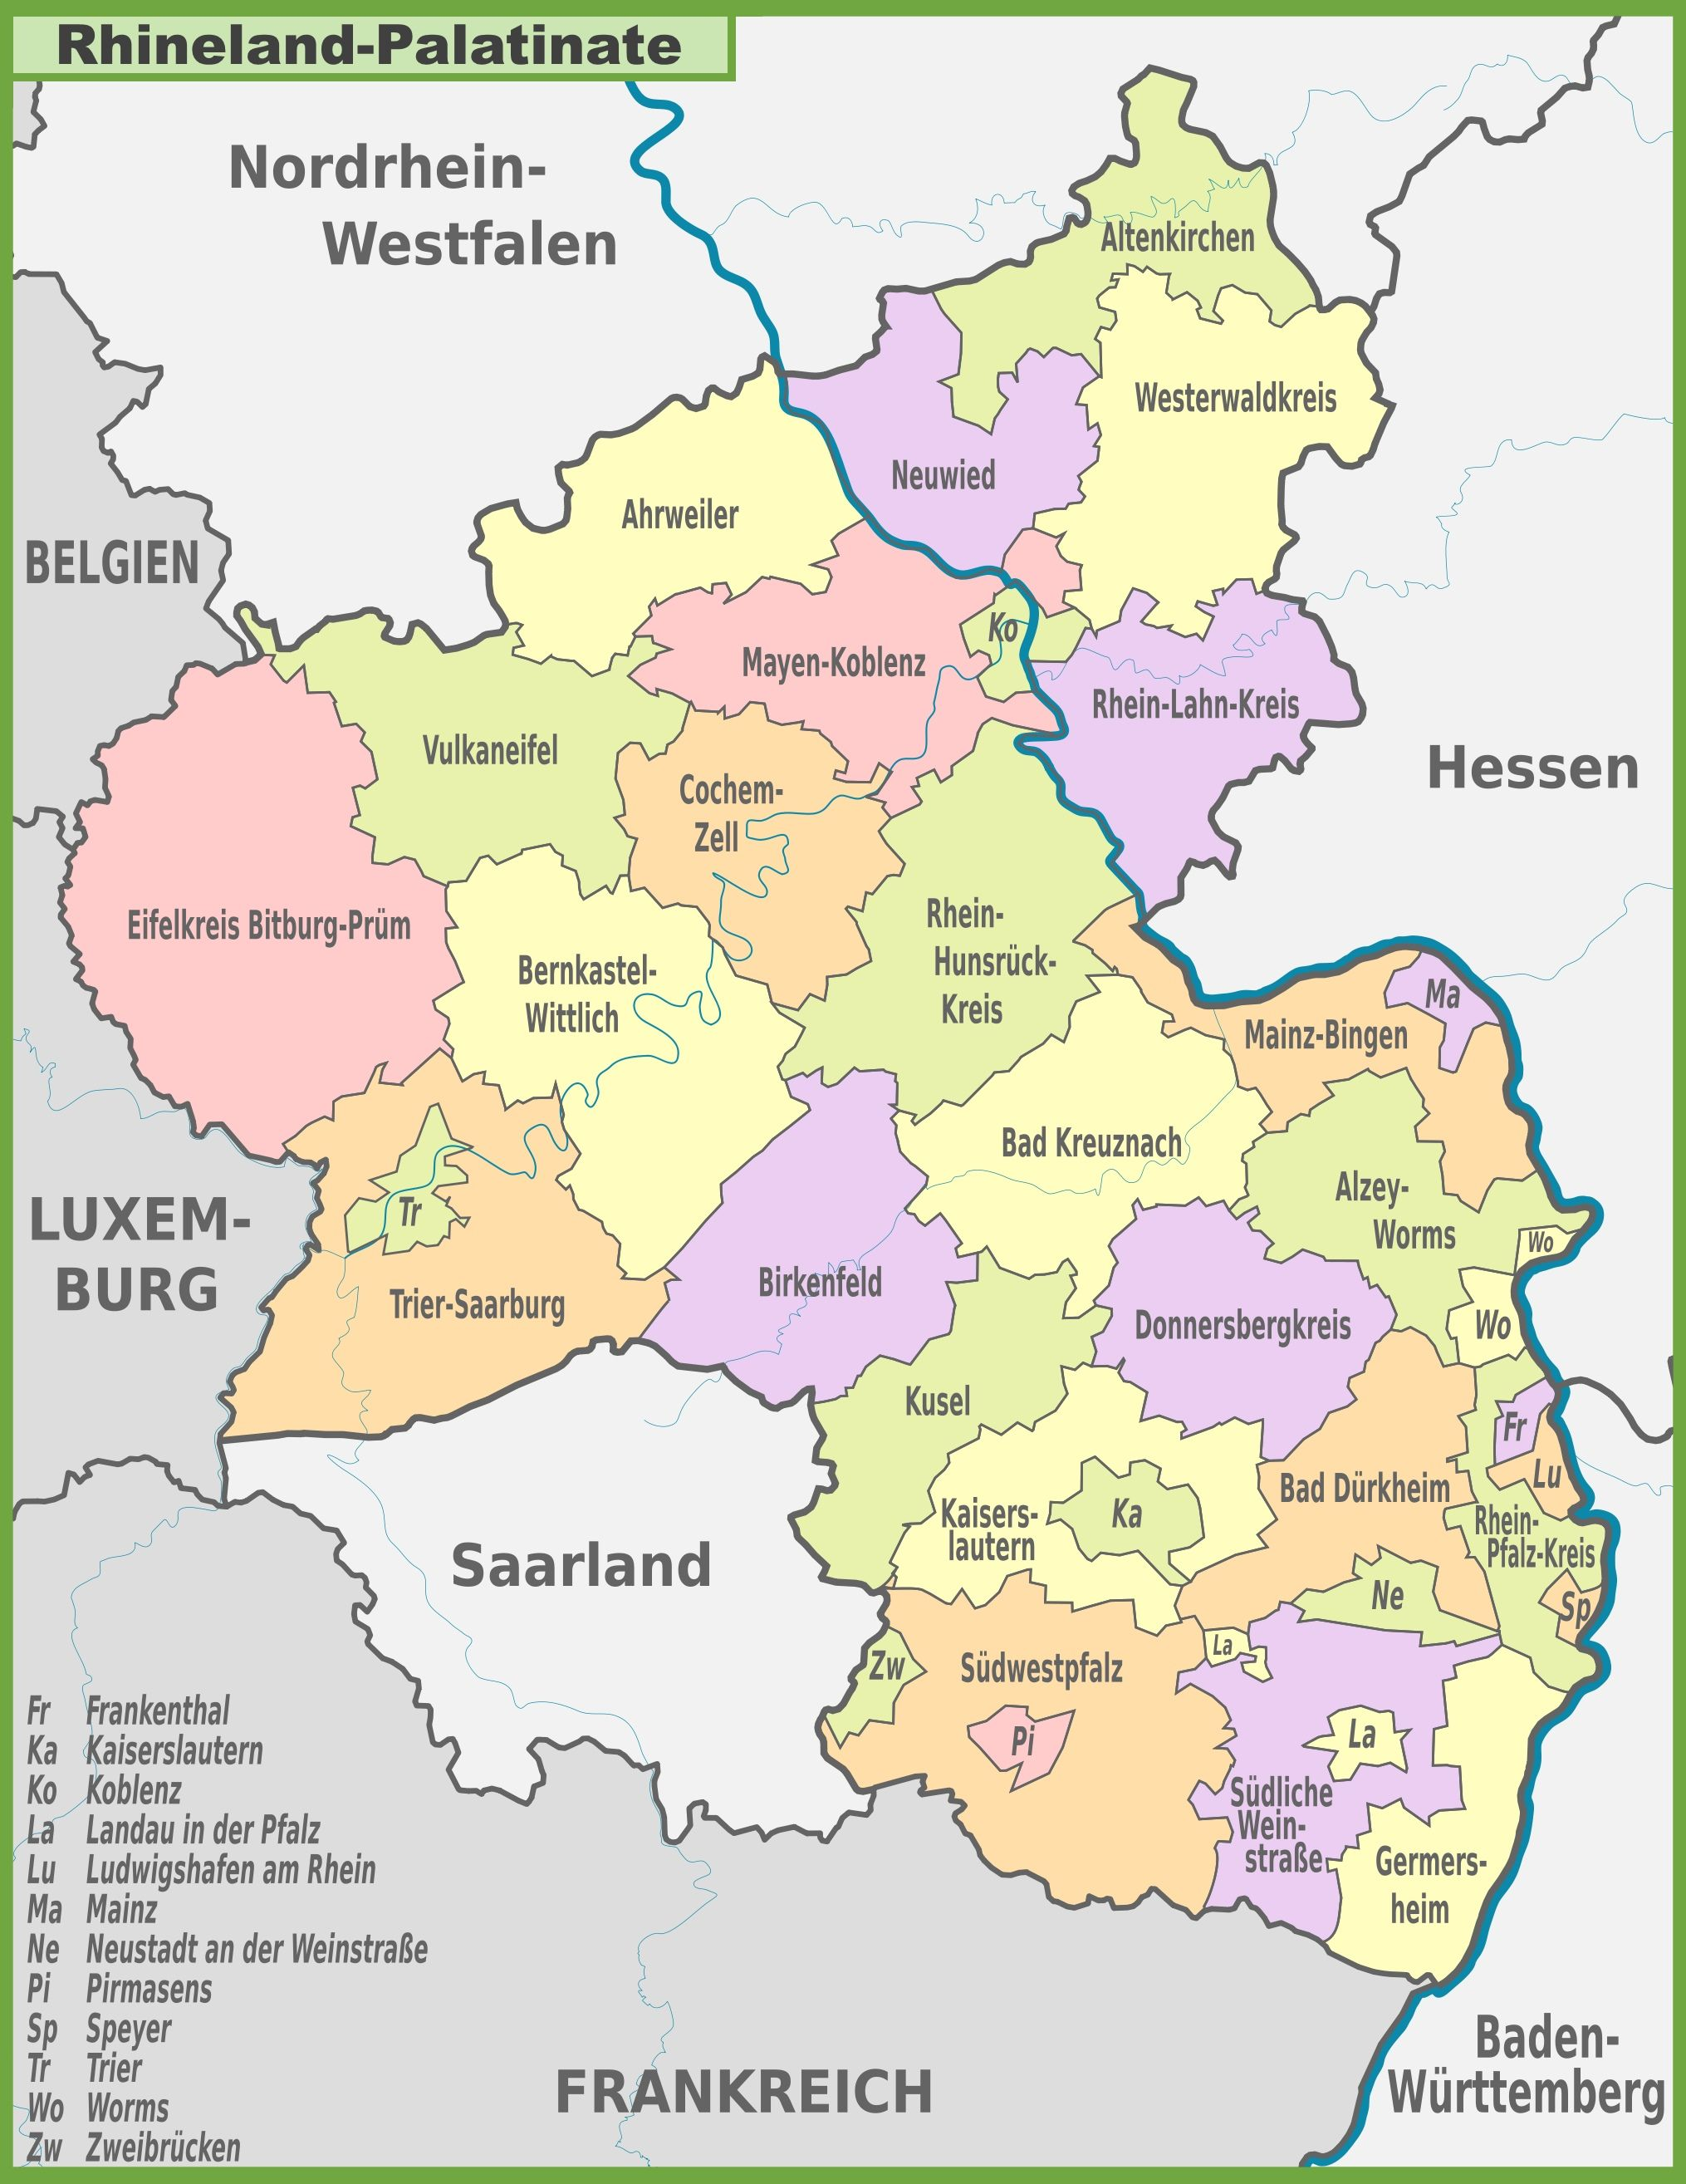 administrativedivisionsmapofrhinelandpalatinatejpg 20302629